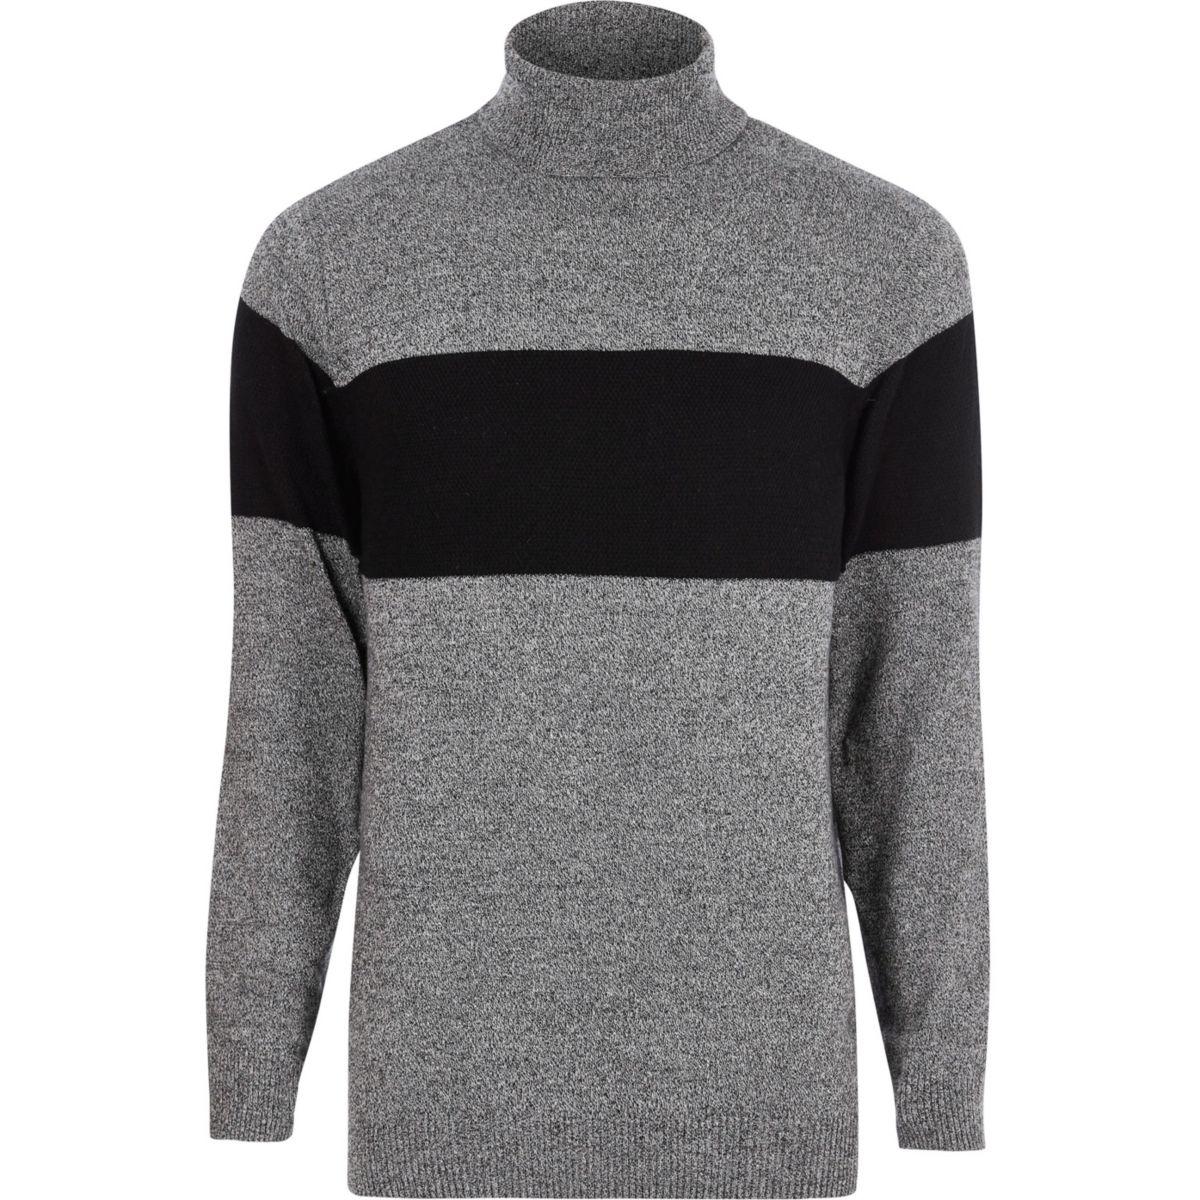 Grey block stripe roll neck knit jumper